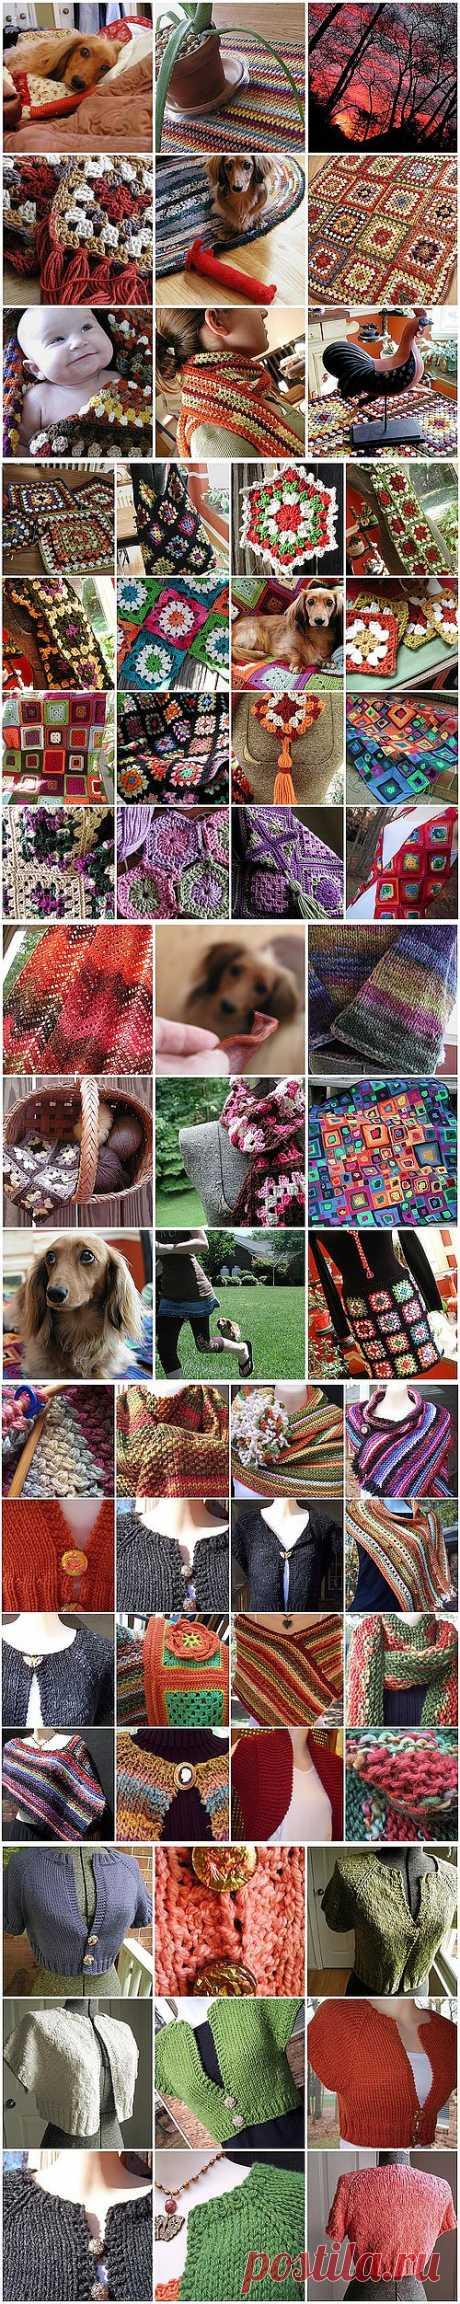 Fiddlesticks - My crochet and knitting ramblings.: Gallery